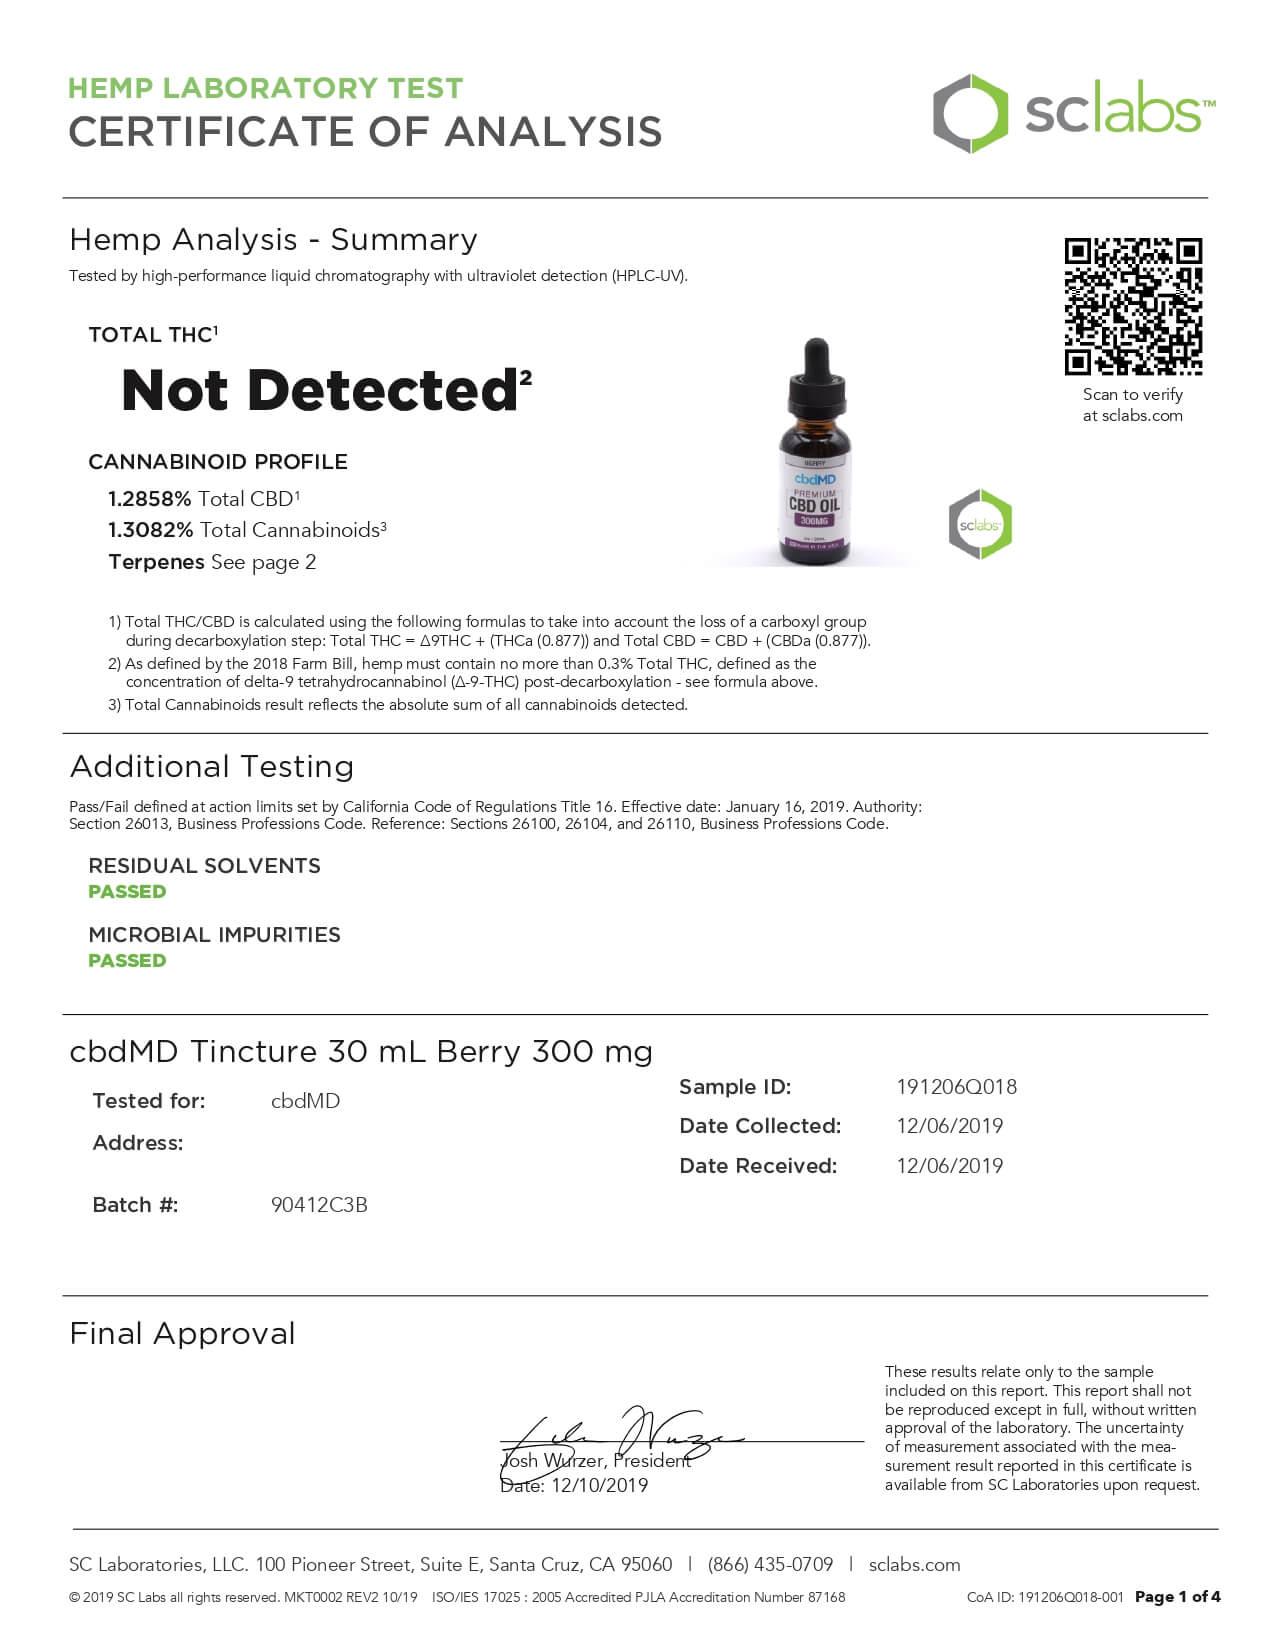 cbdMD CBD Tincture Broad Spectrum Berry 30ml 300mg Lab Report